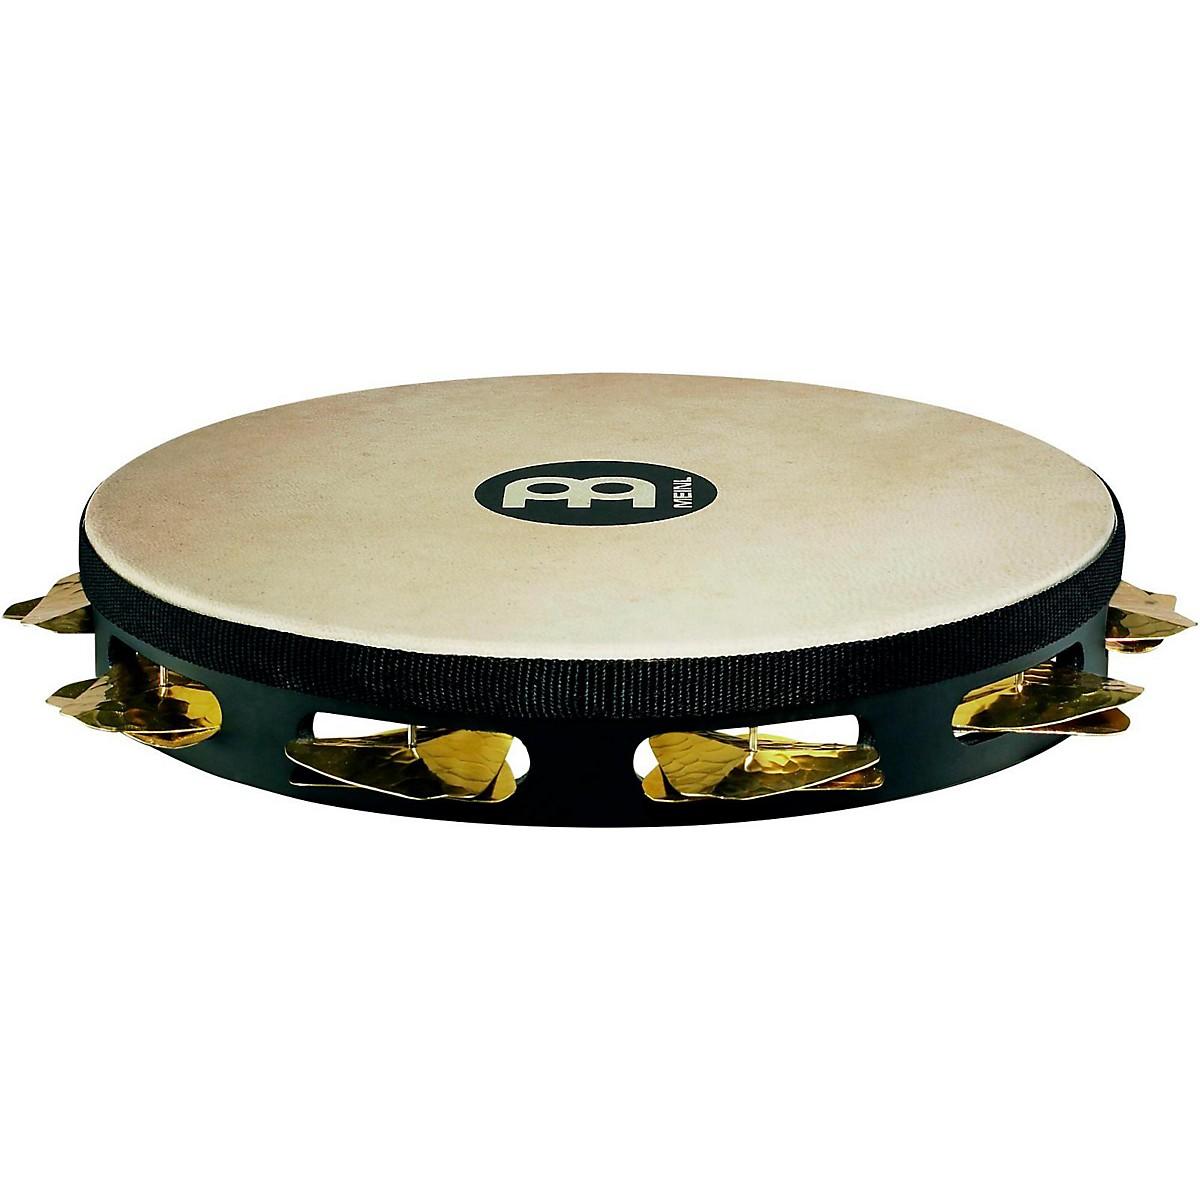 Meinl Super-Dry Studio Goat-Skin Wood Tambourine One Row Brass Jingles